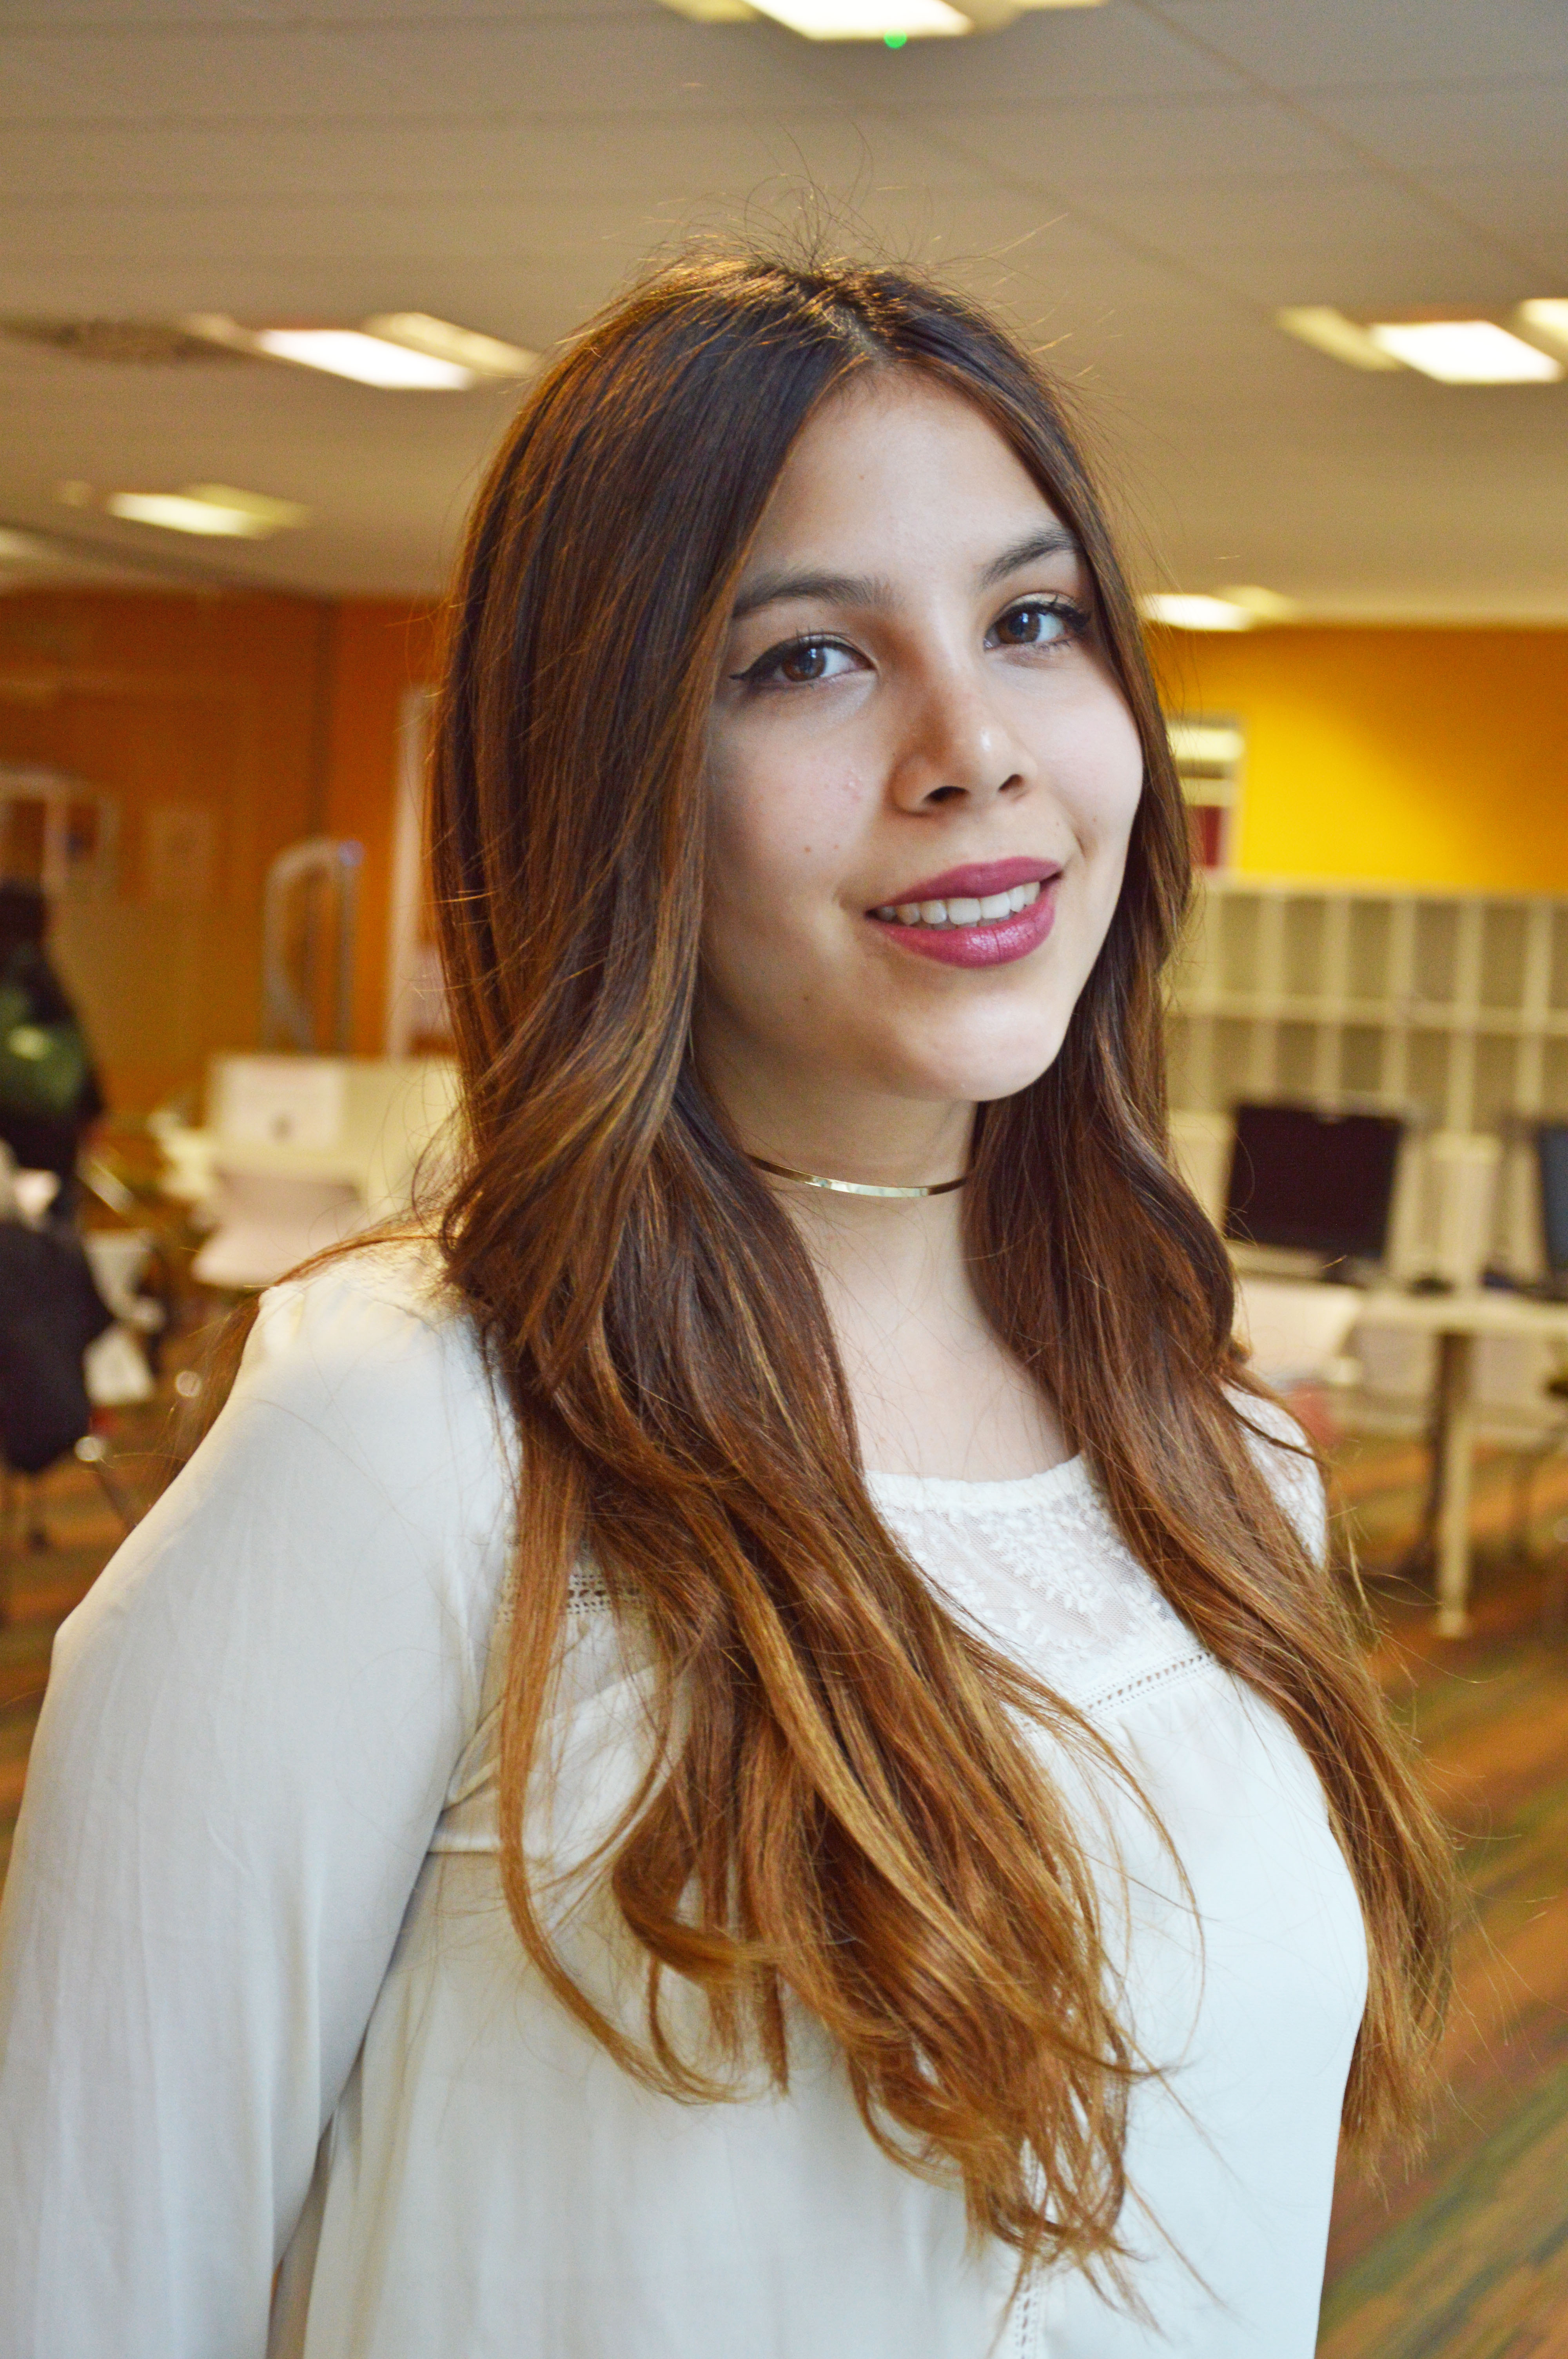 Photo of international student Gabriella at INTO London